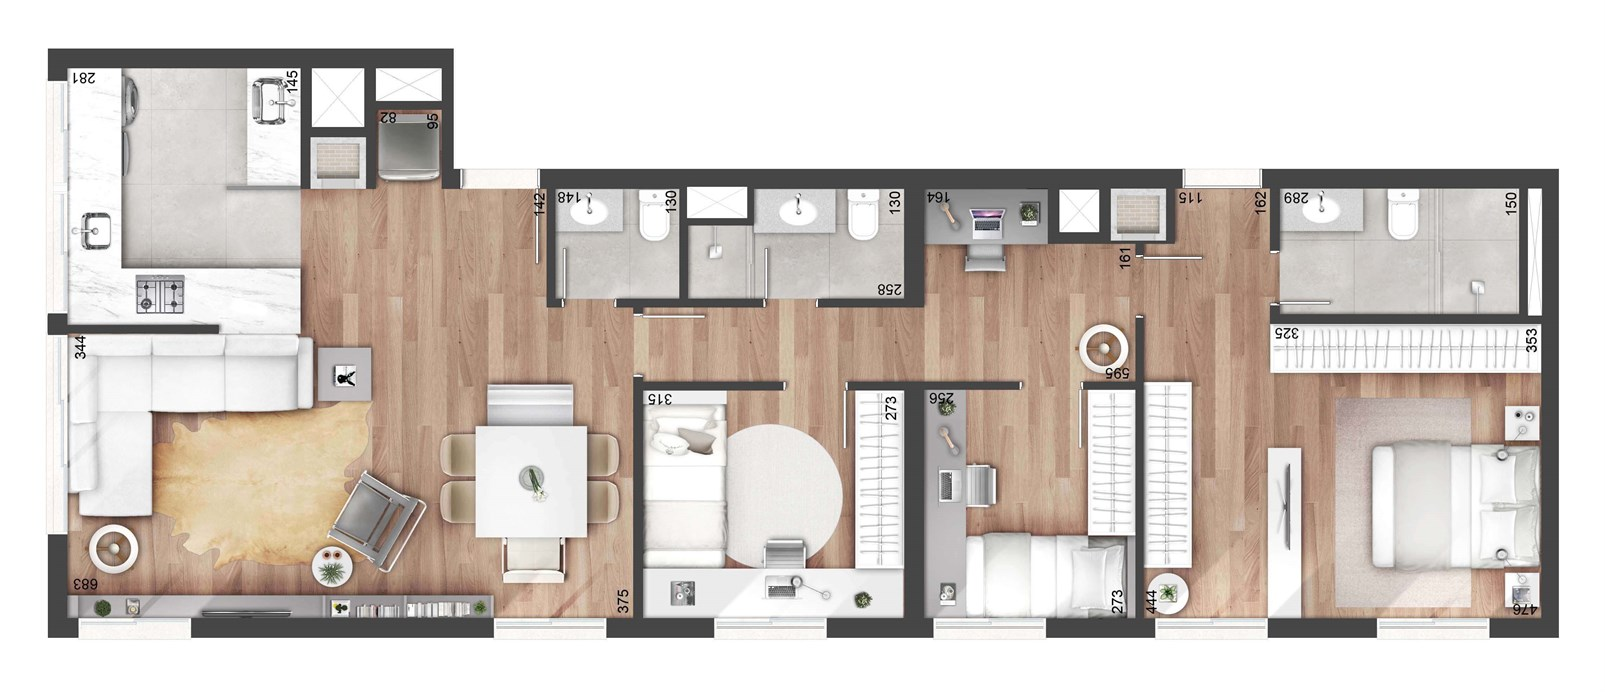 3 dormitorios 108m² | NY, 205 – Apartamentono  Auxiliadora - Porto Alegre - Rio Grande do Sul